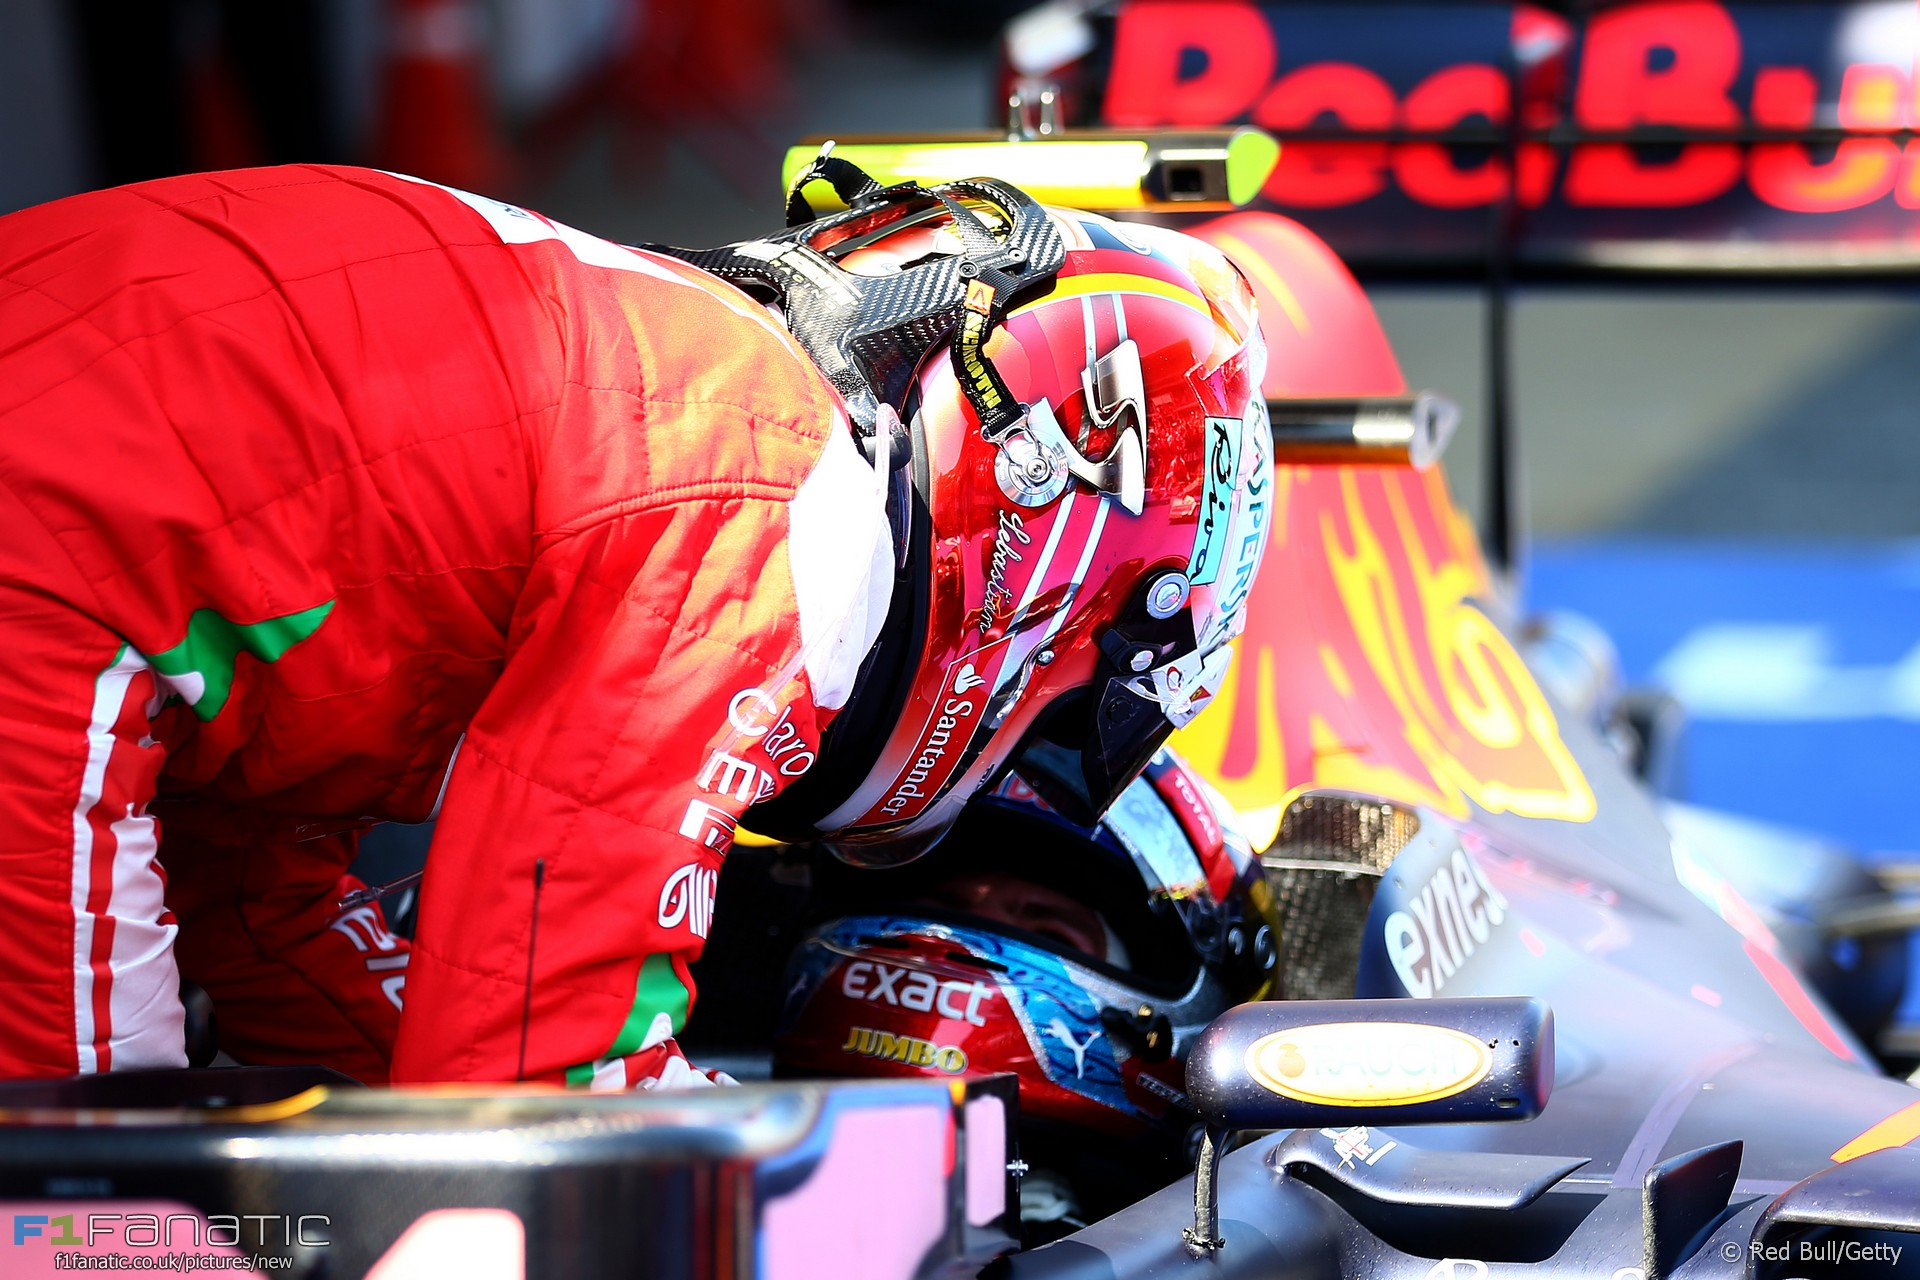 Sebastian Vettel, Max Verstappen, Circuit de Catalunya, 2016